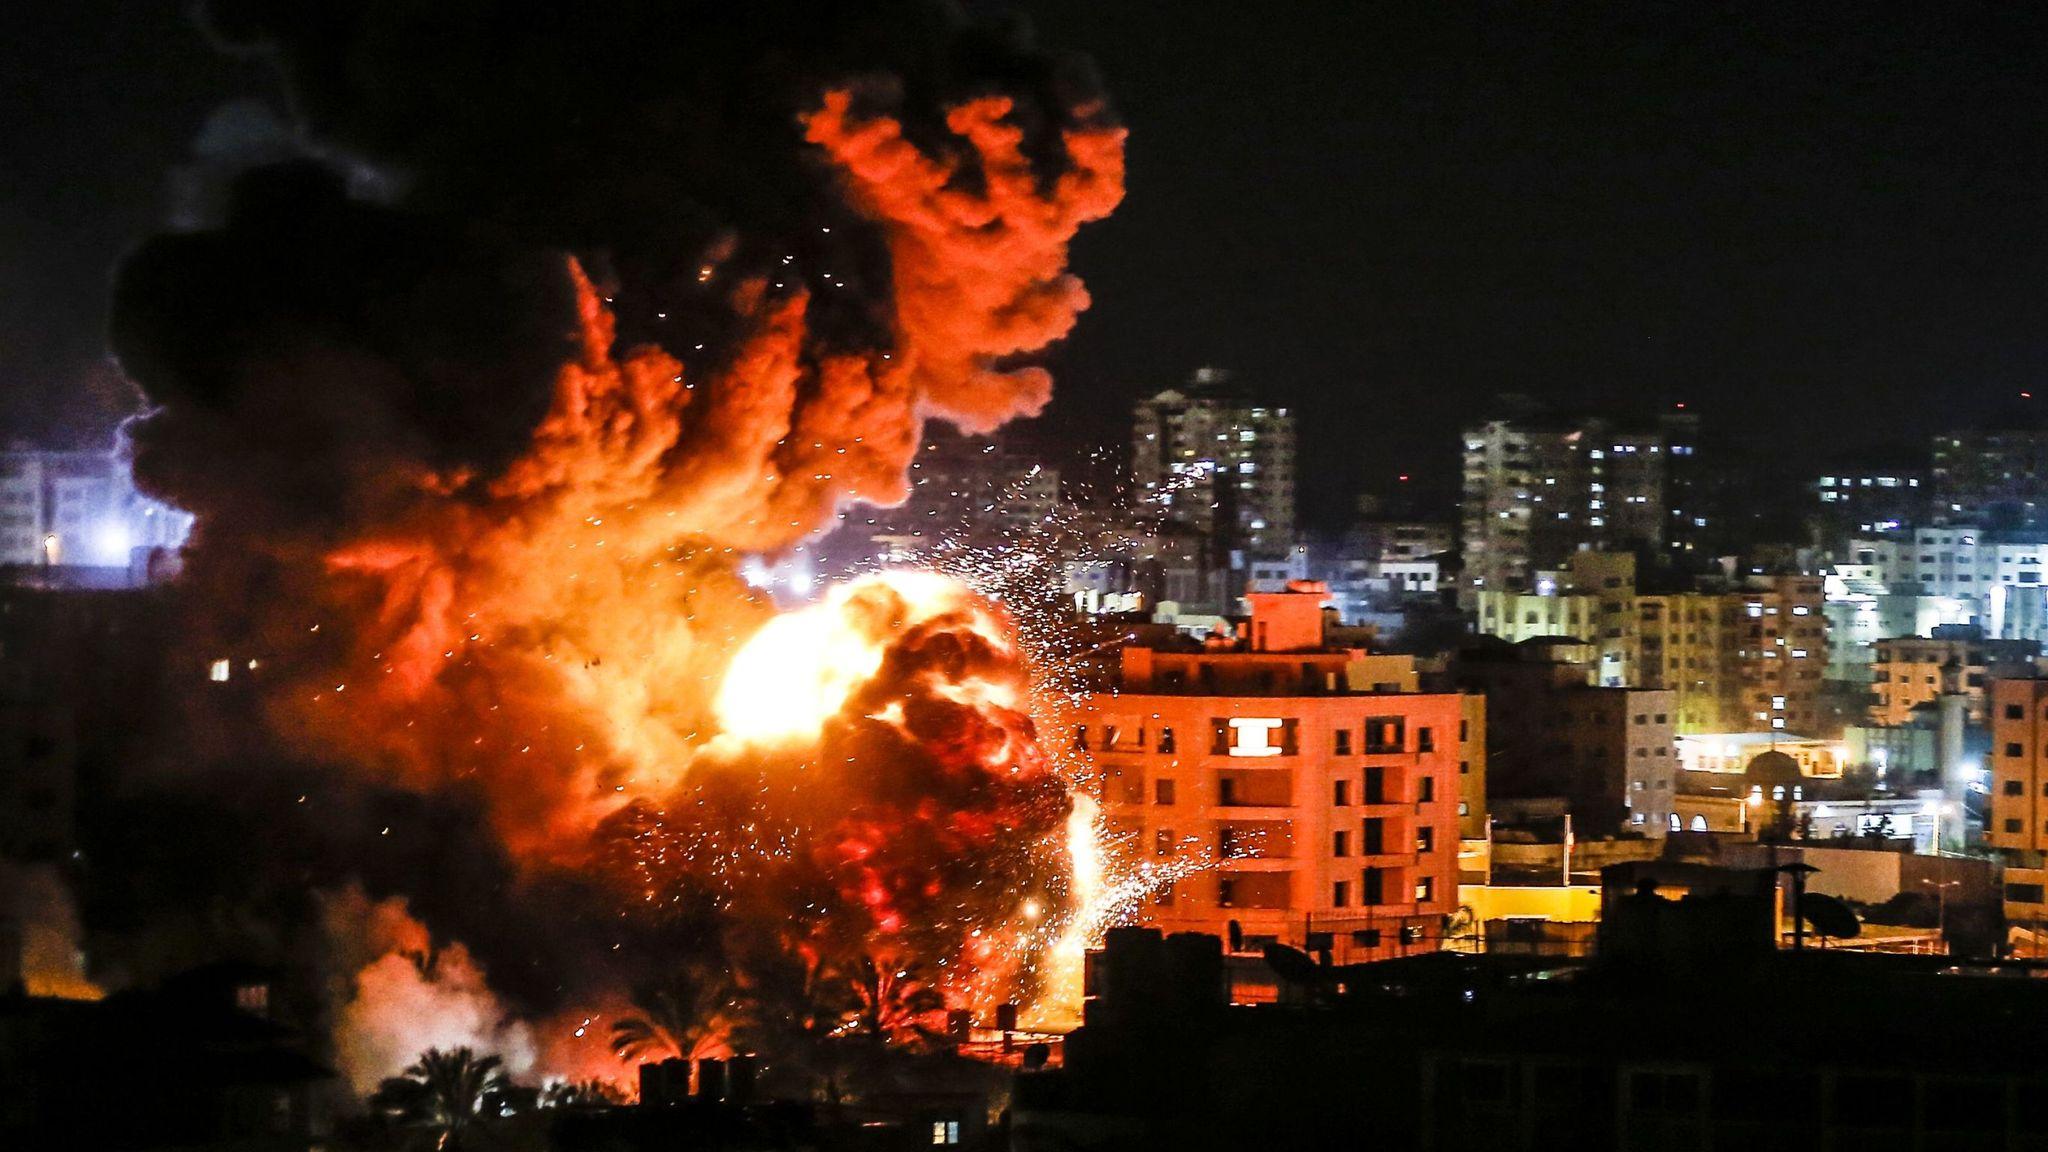 Palestinians report several killed in Israeli air raids on Gaza